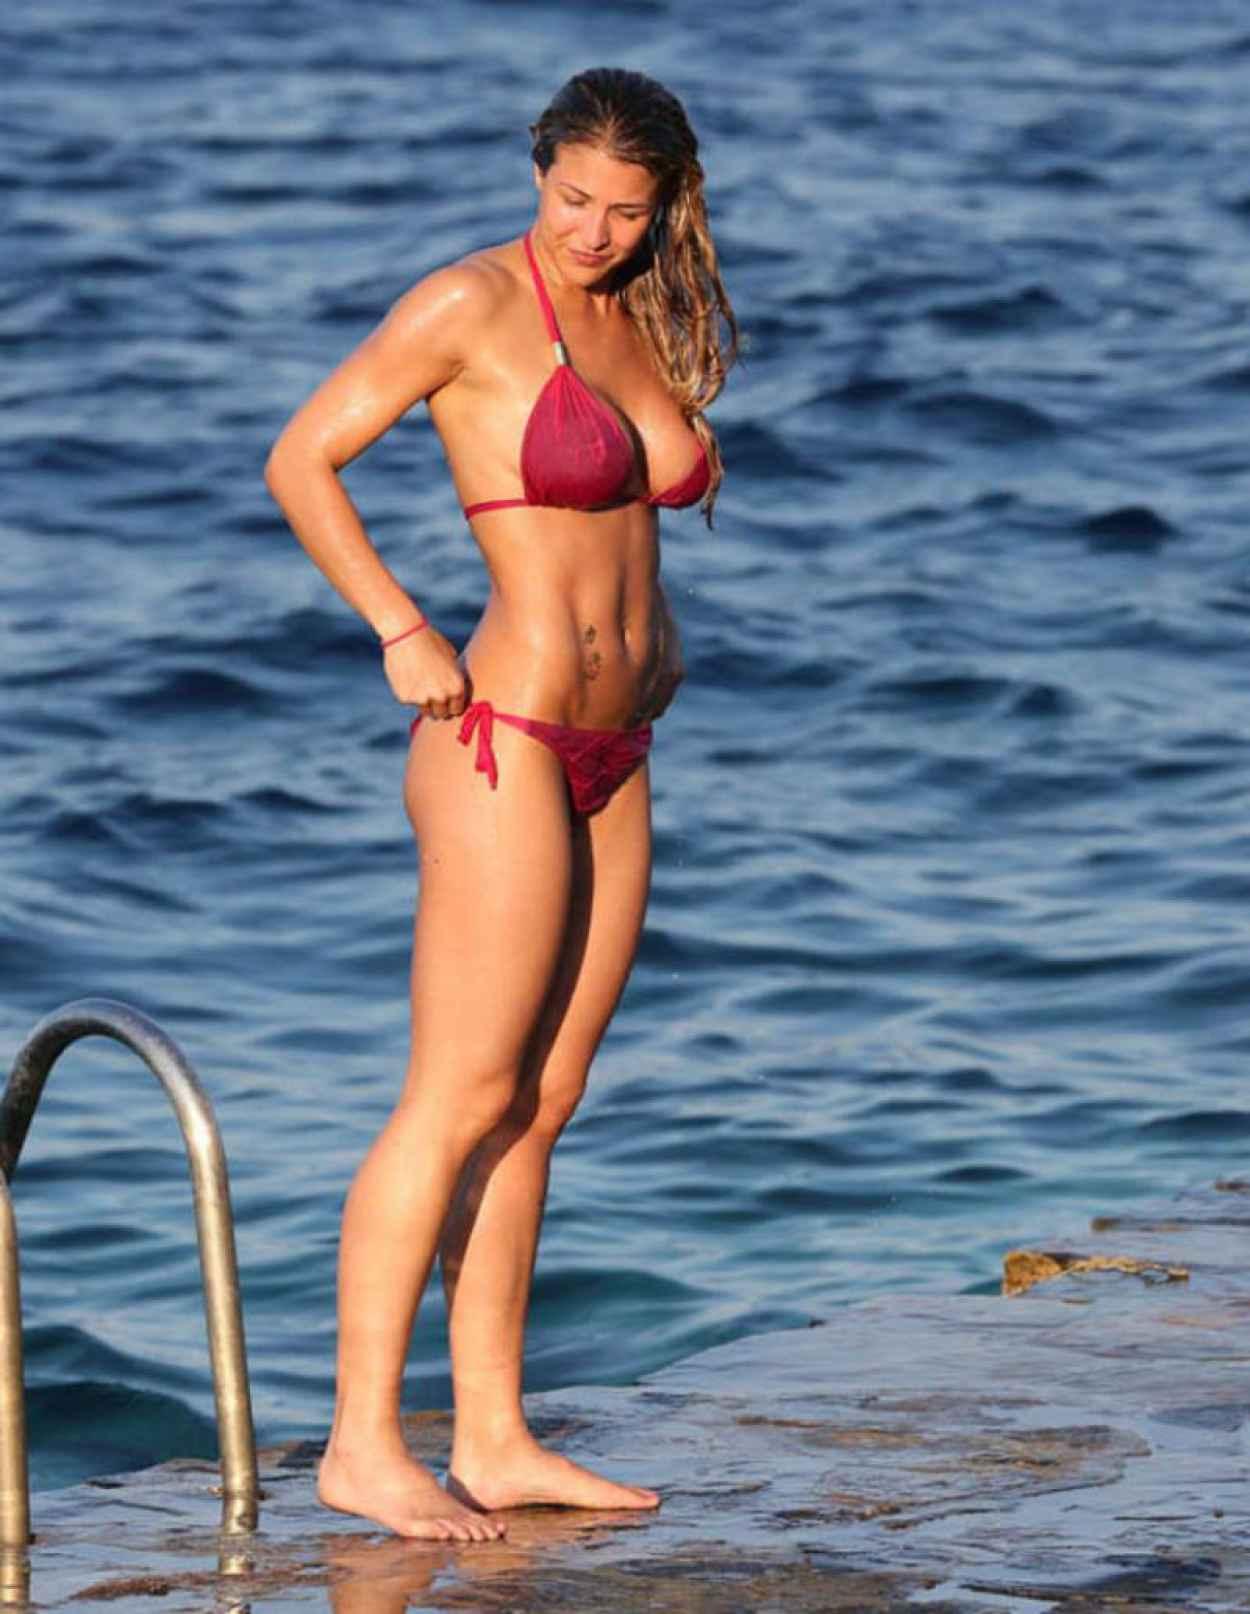 Gemma Atkinson in Pink Bikini - March 2015-1